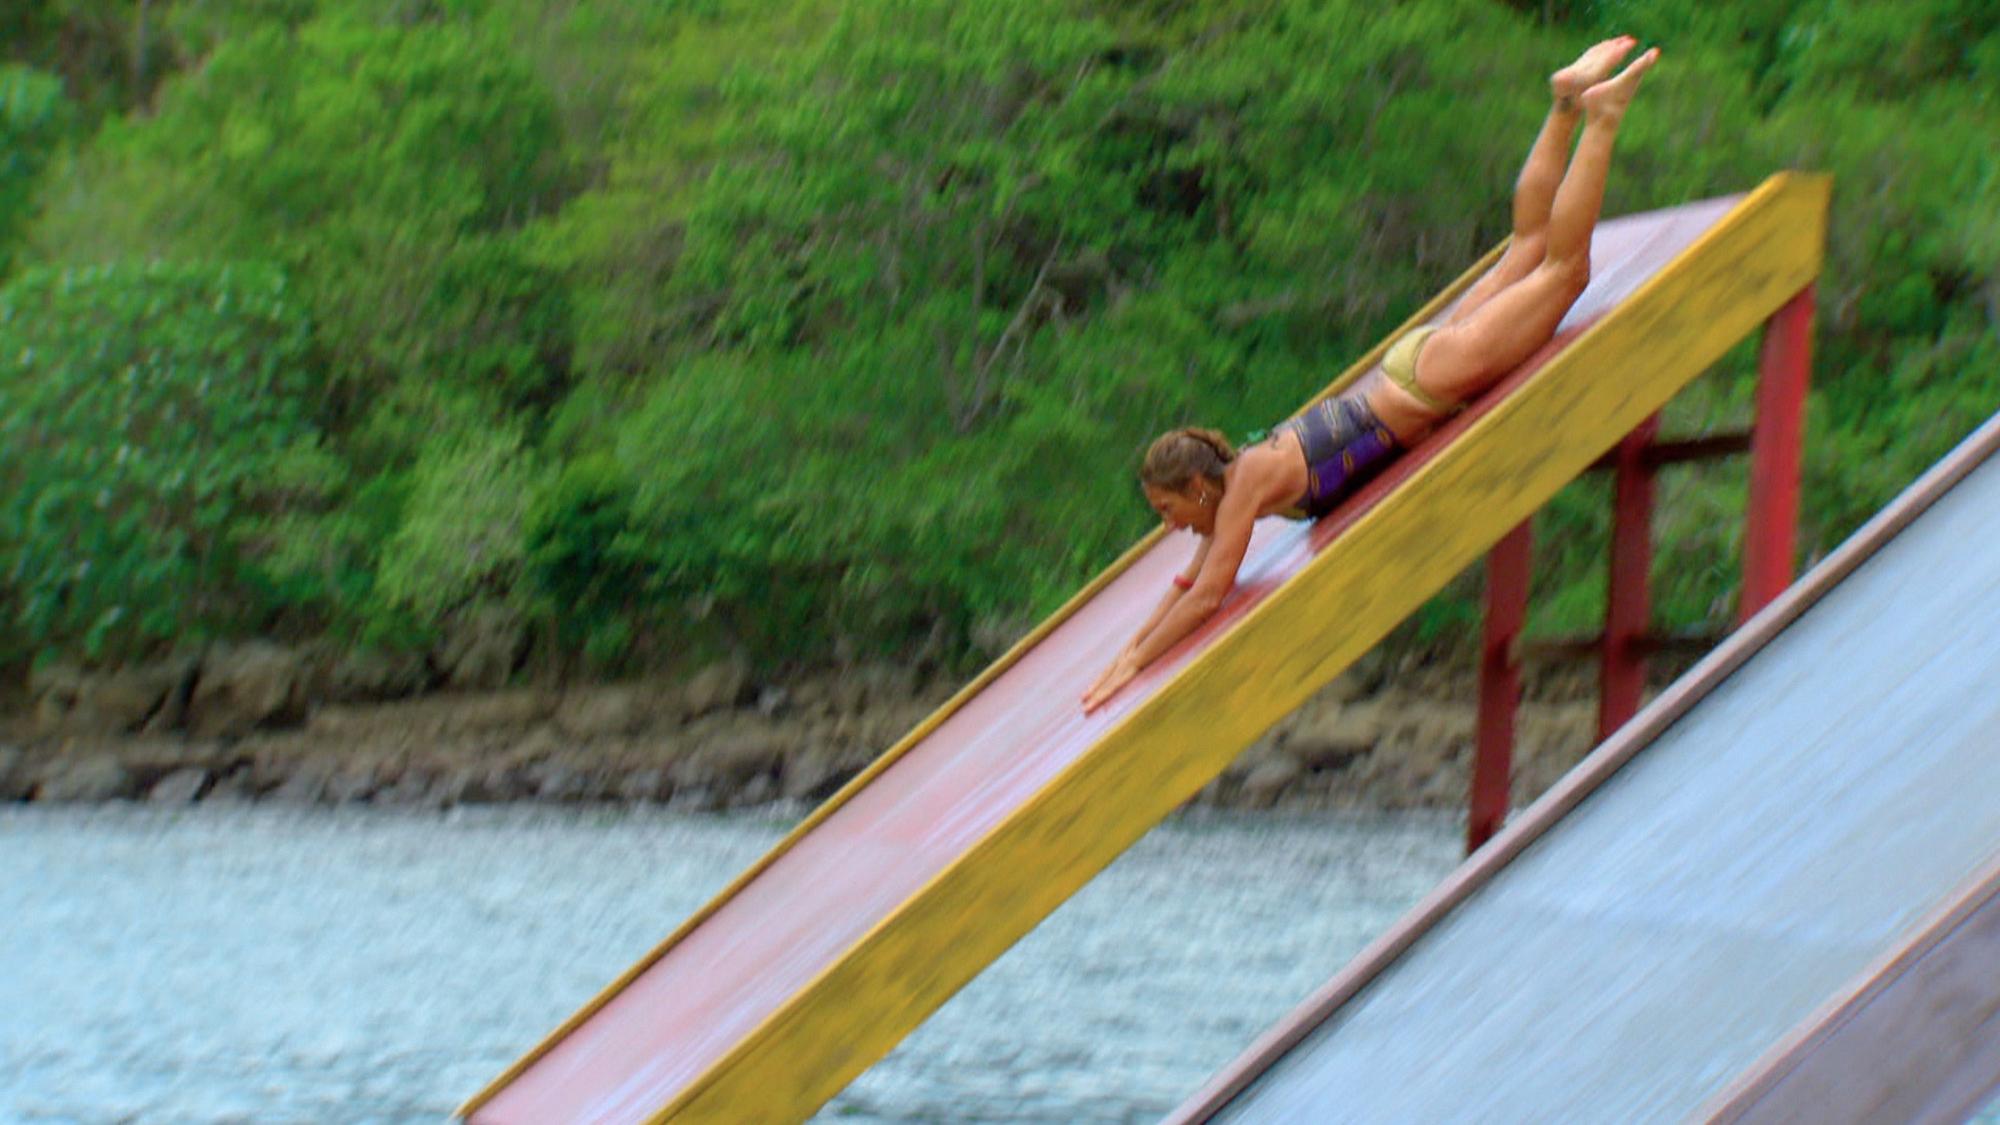 Carolyn slips down the ramp